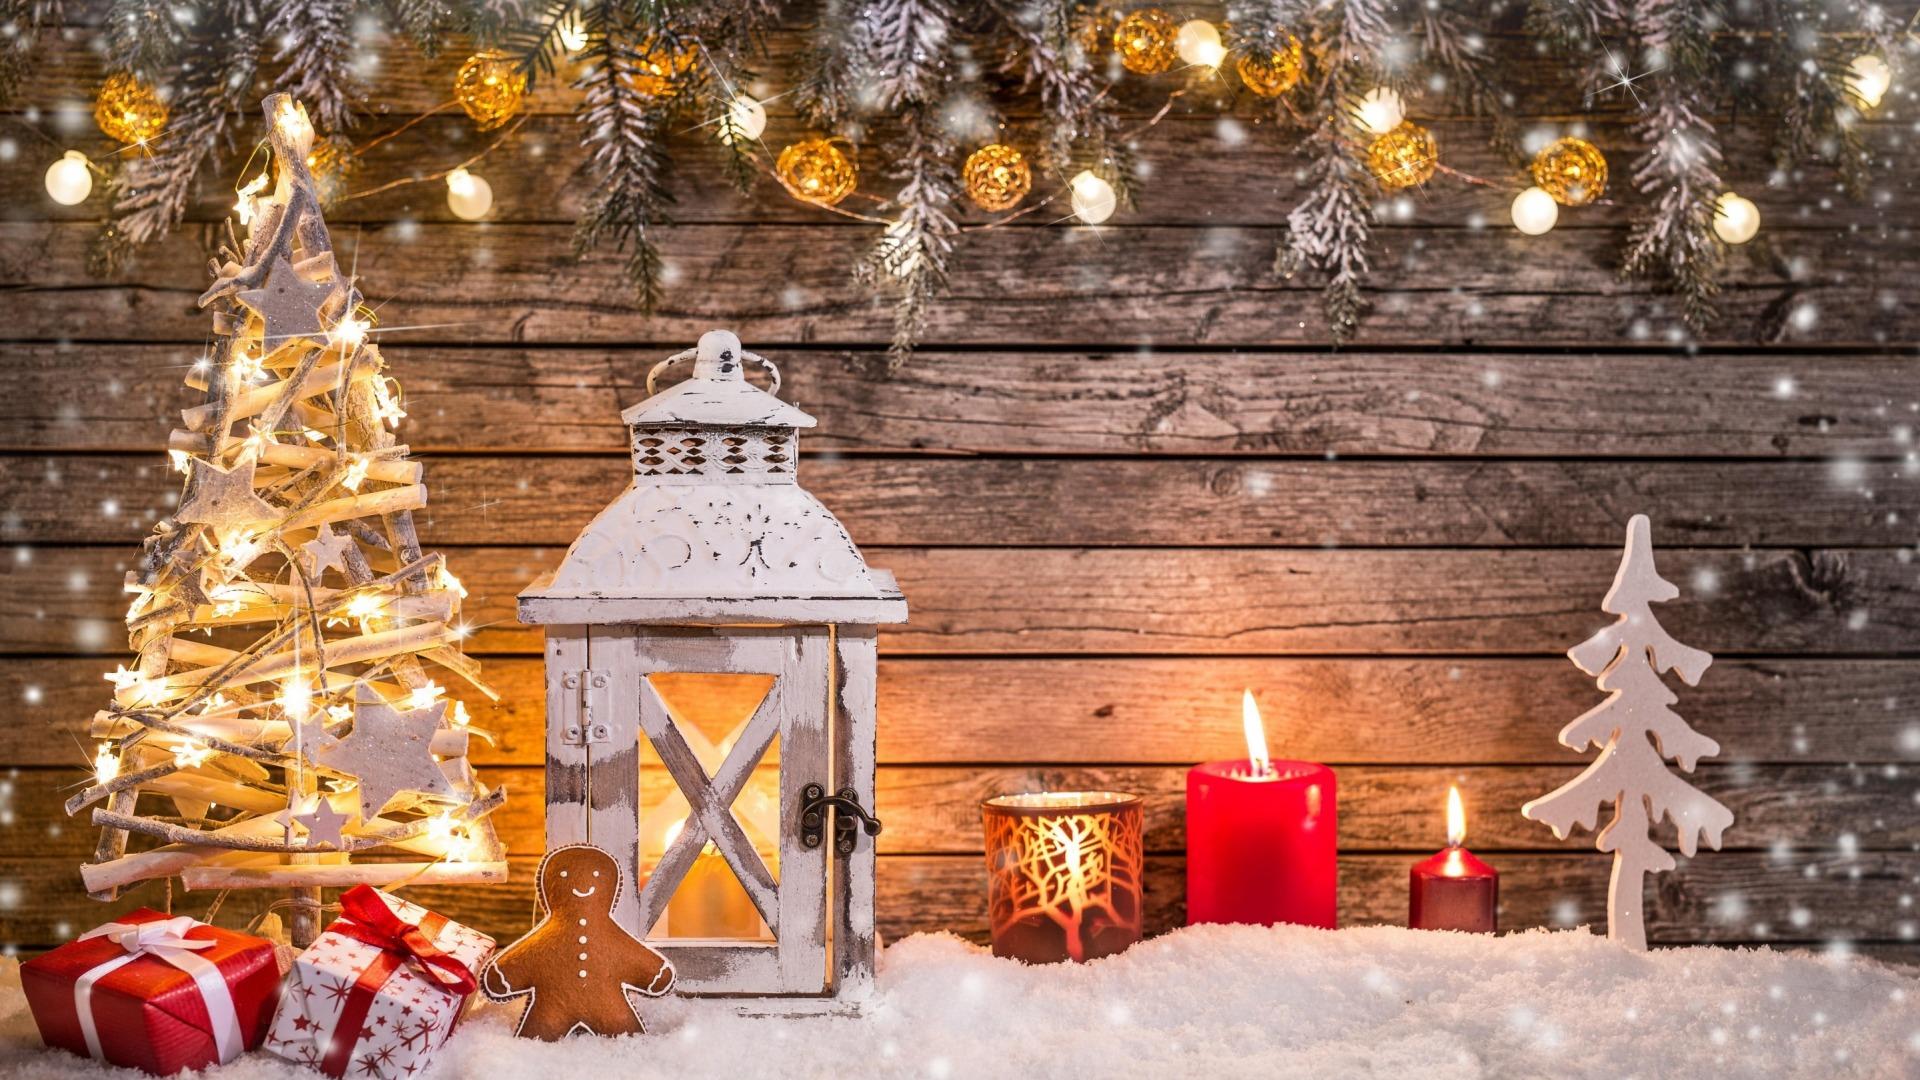 Merry-Christmas-Wallpaper-5